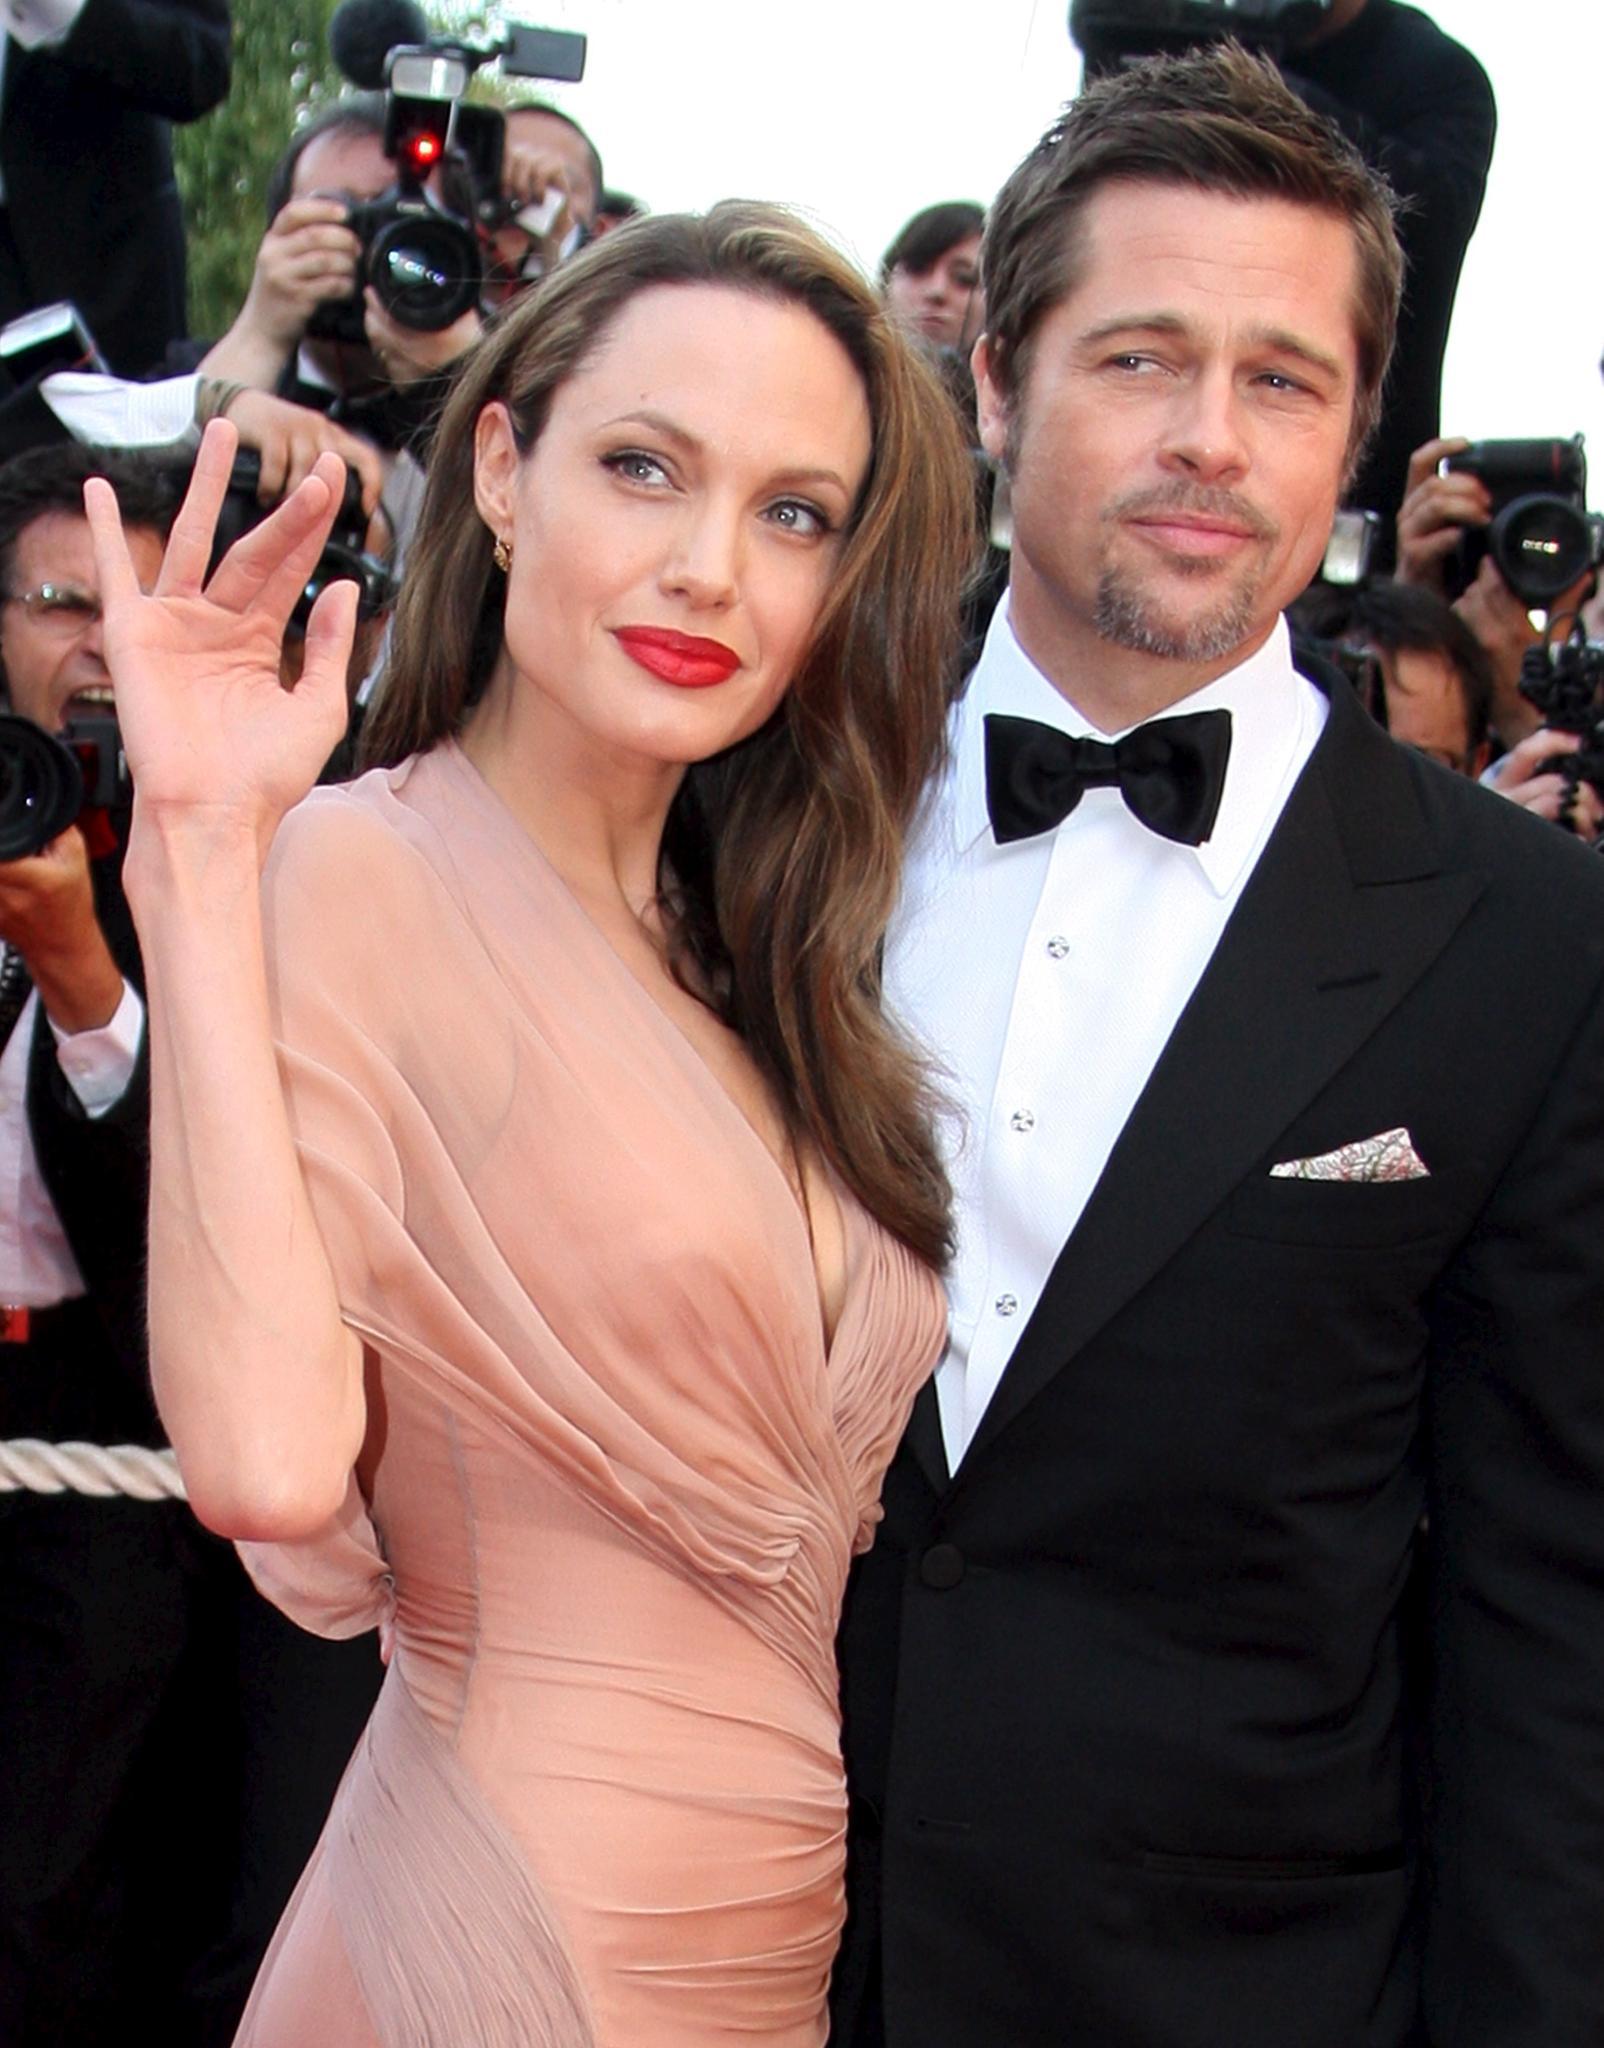 Анджелина Джоли и Меган Фокс се конкурират за роля